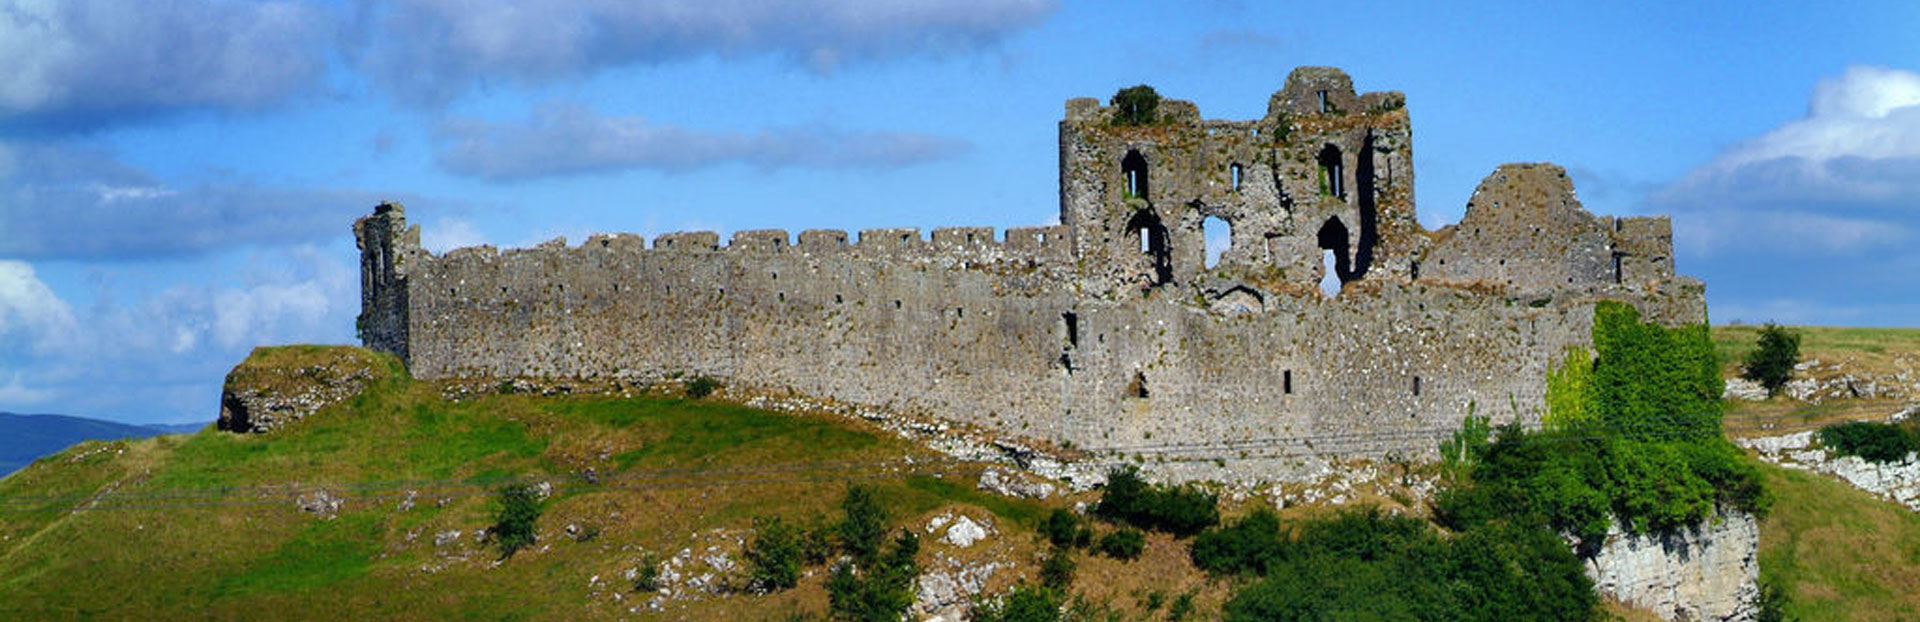 Roach-Castle-Dundalk-C.jpg